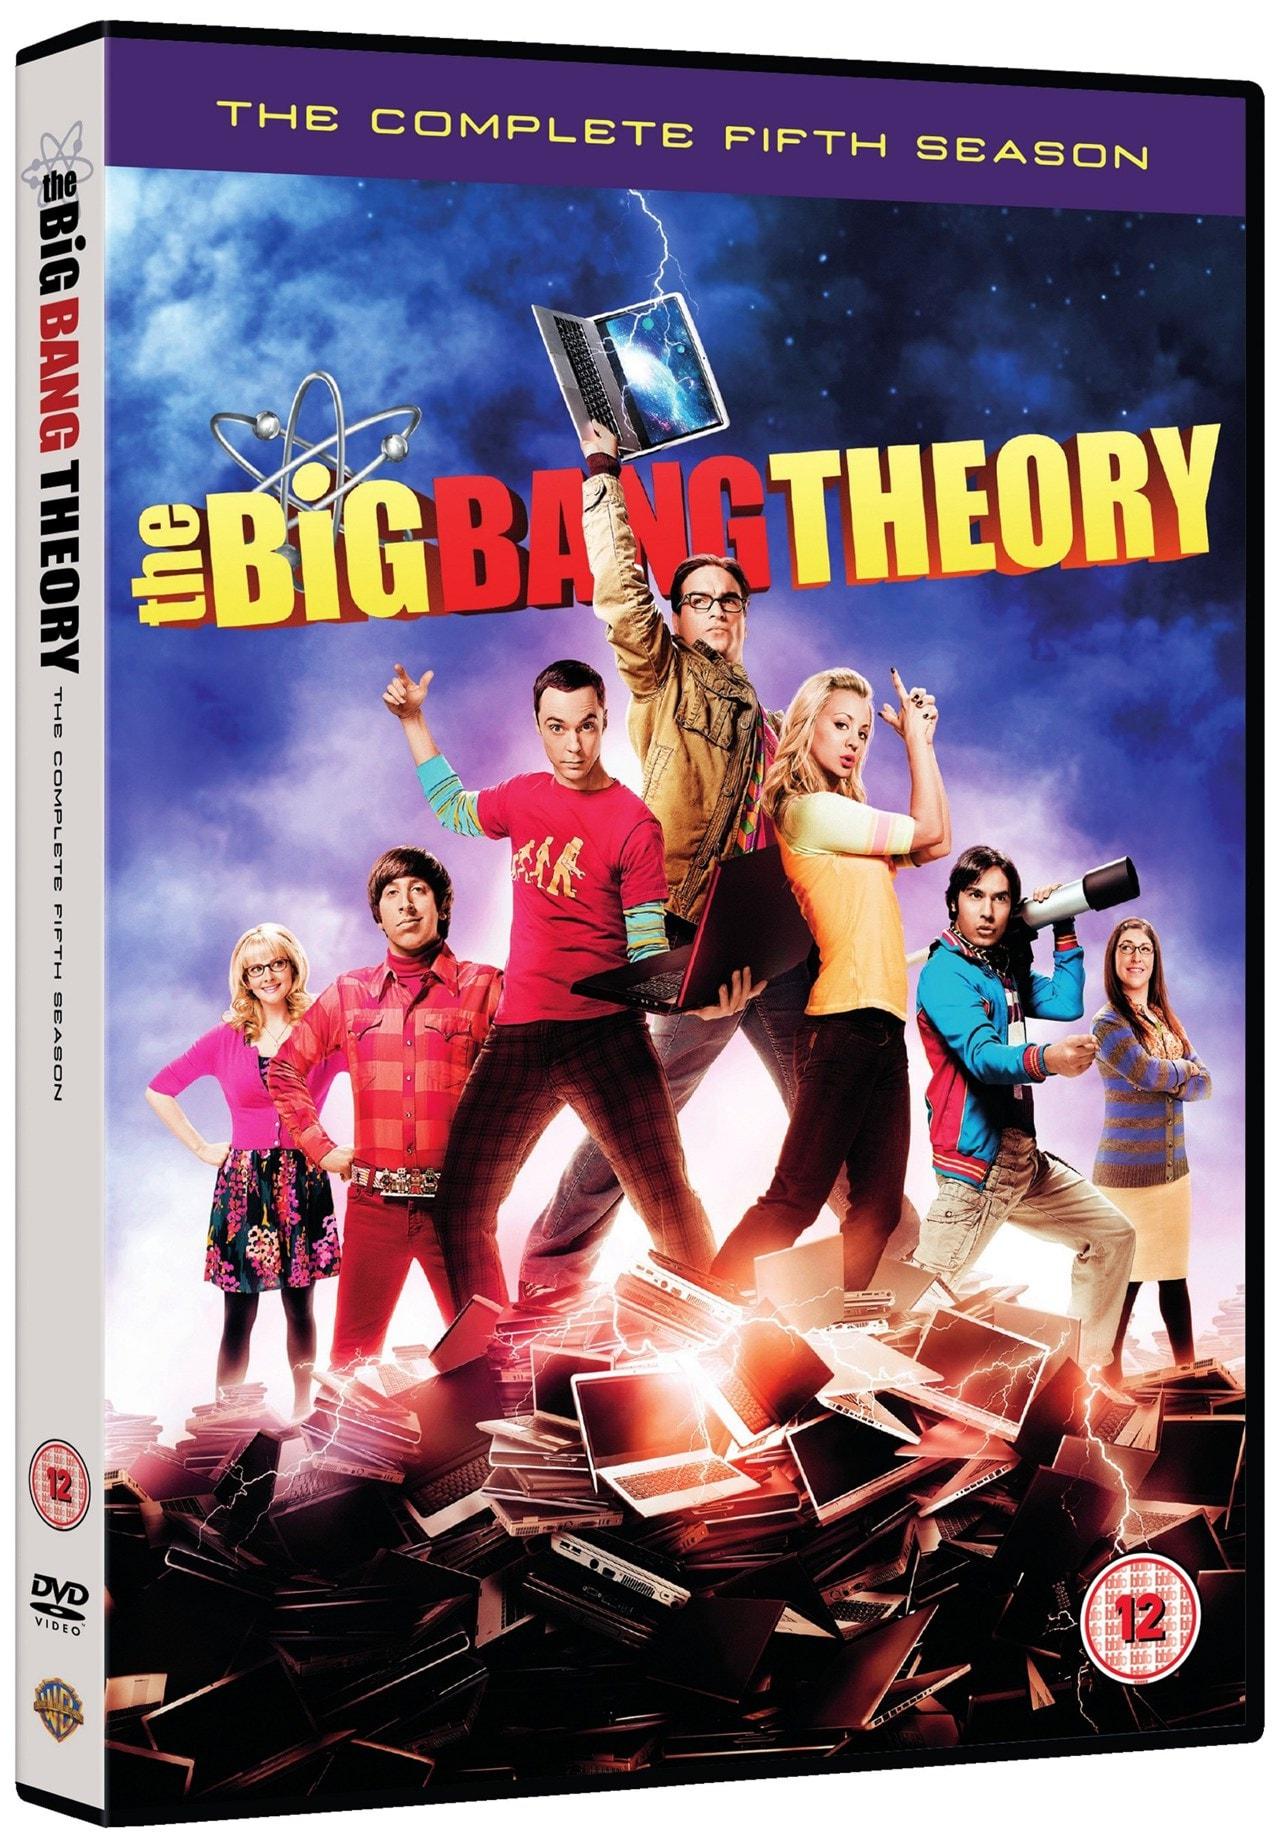 The Big Bang Theory: The Complete Fifth Season - 2